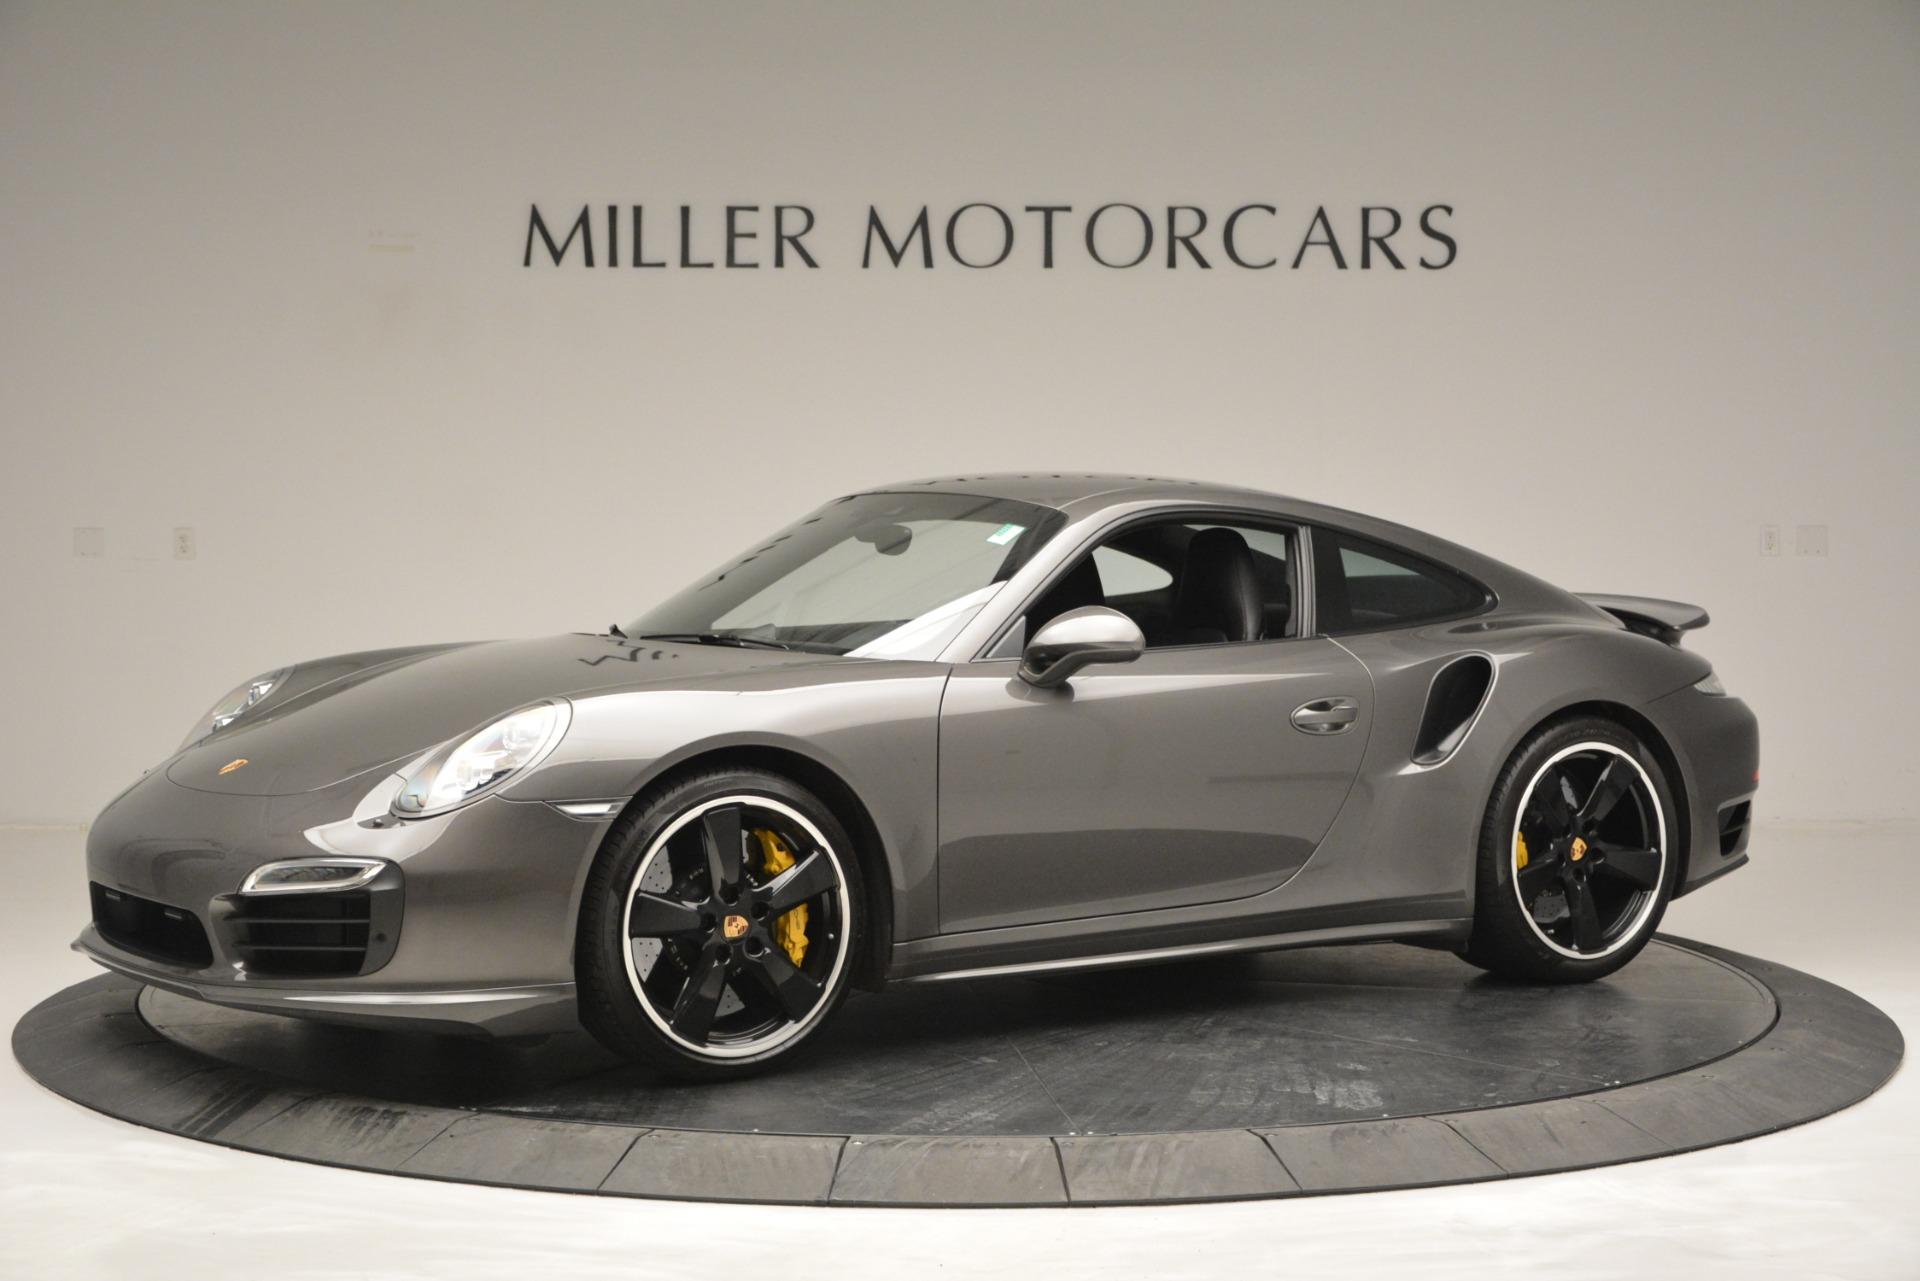 Used 2015 Porsche 911 Turbo S For Sale In Greenwich, CT 2923_p2